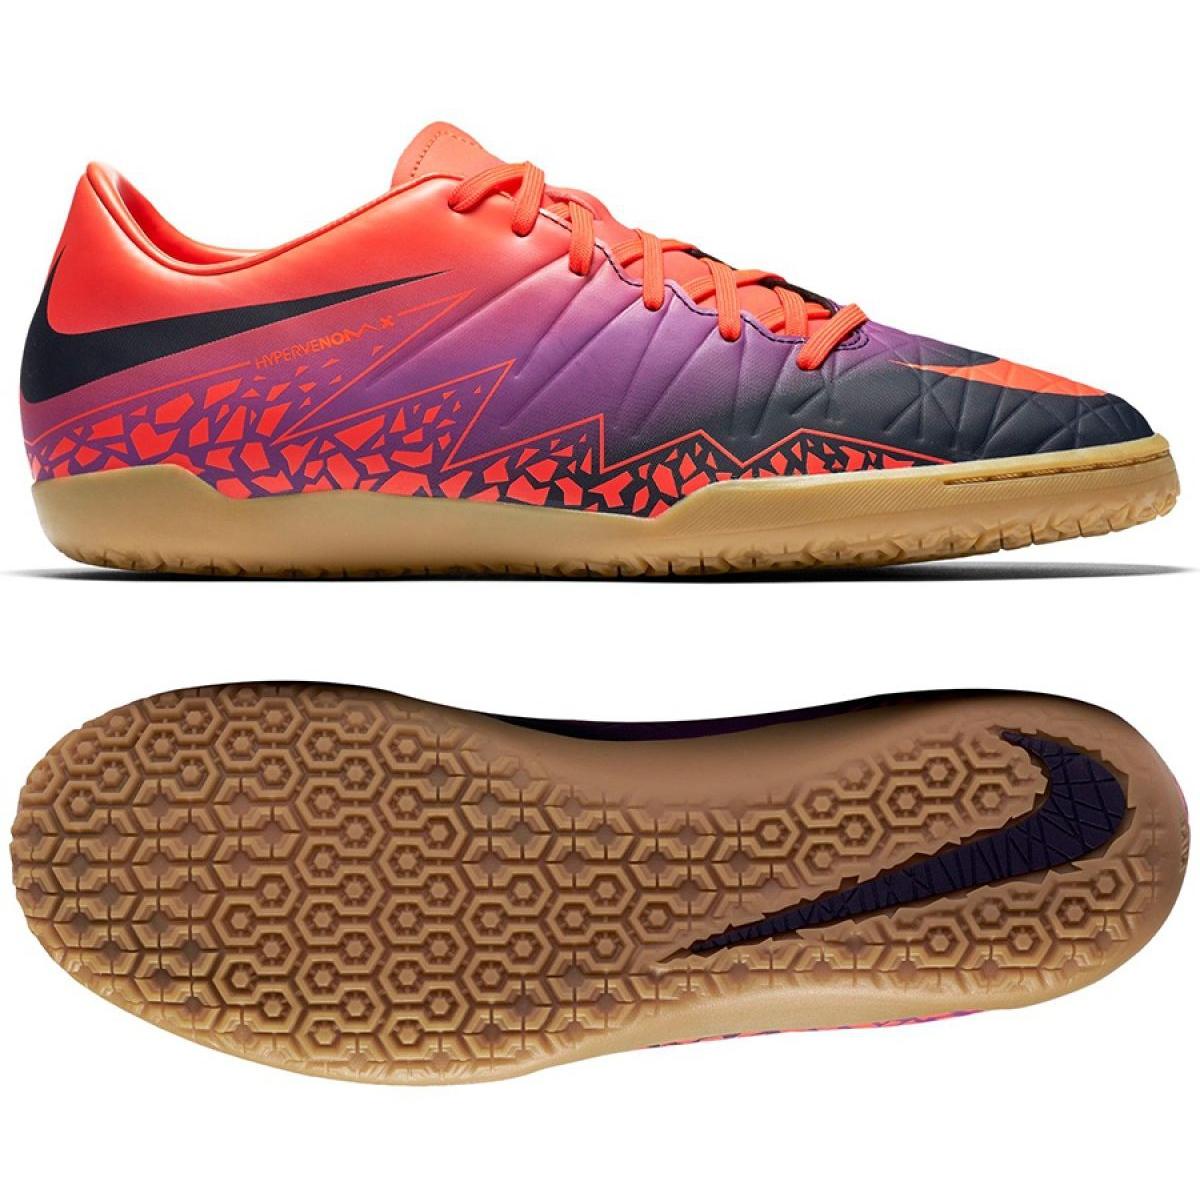 Hallenschuhe Nike Hypervenom Phelon Ii Ic M 749898-845